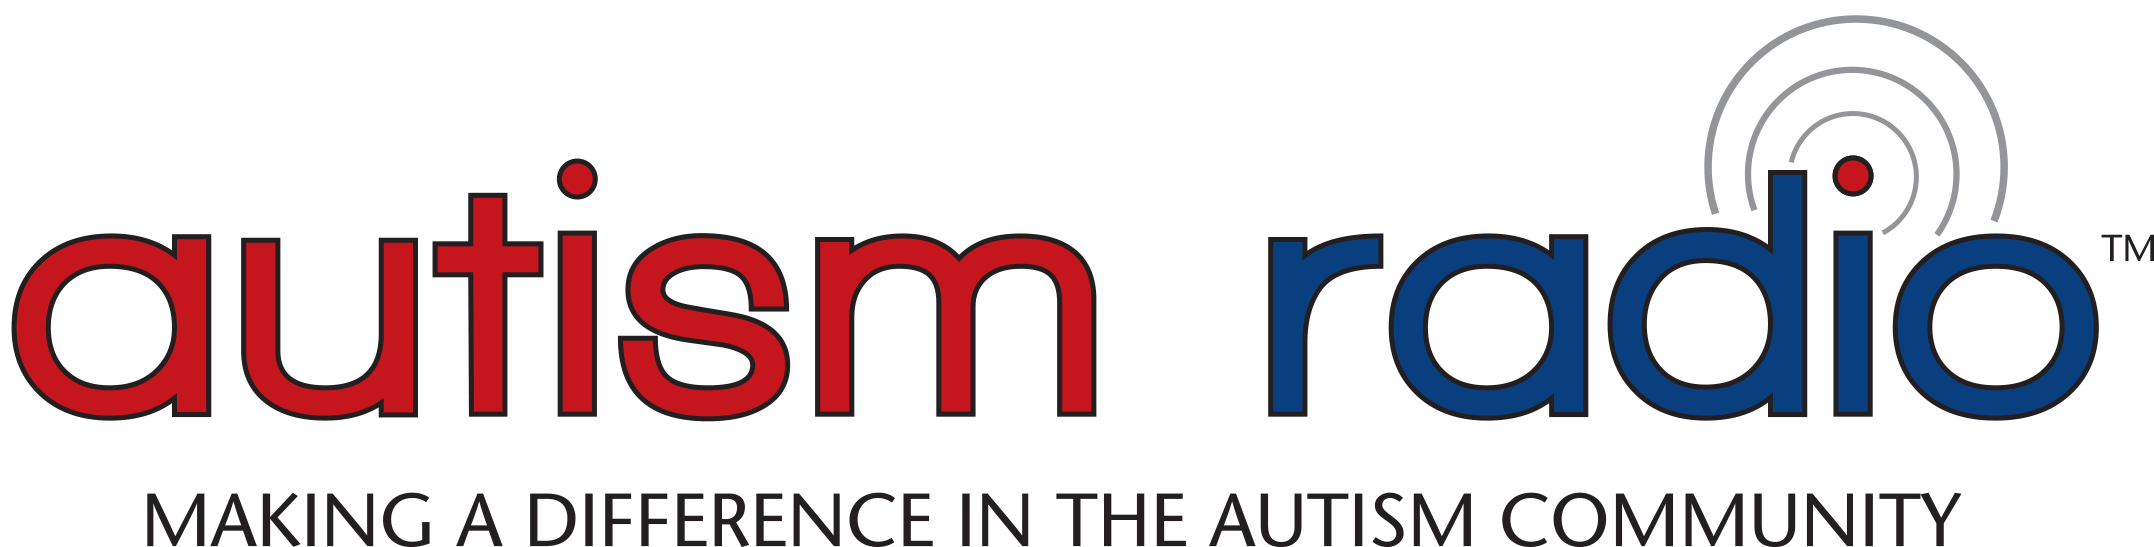 Autism Radio Logos-FINAL color no shad.png